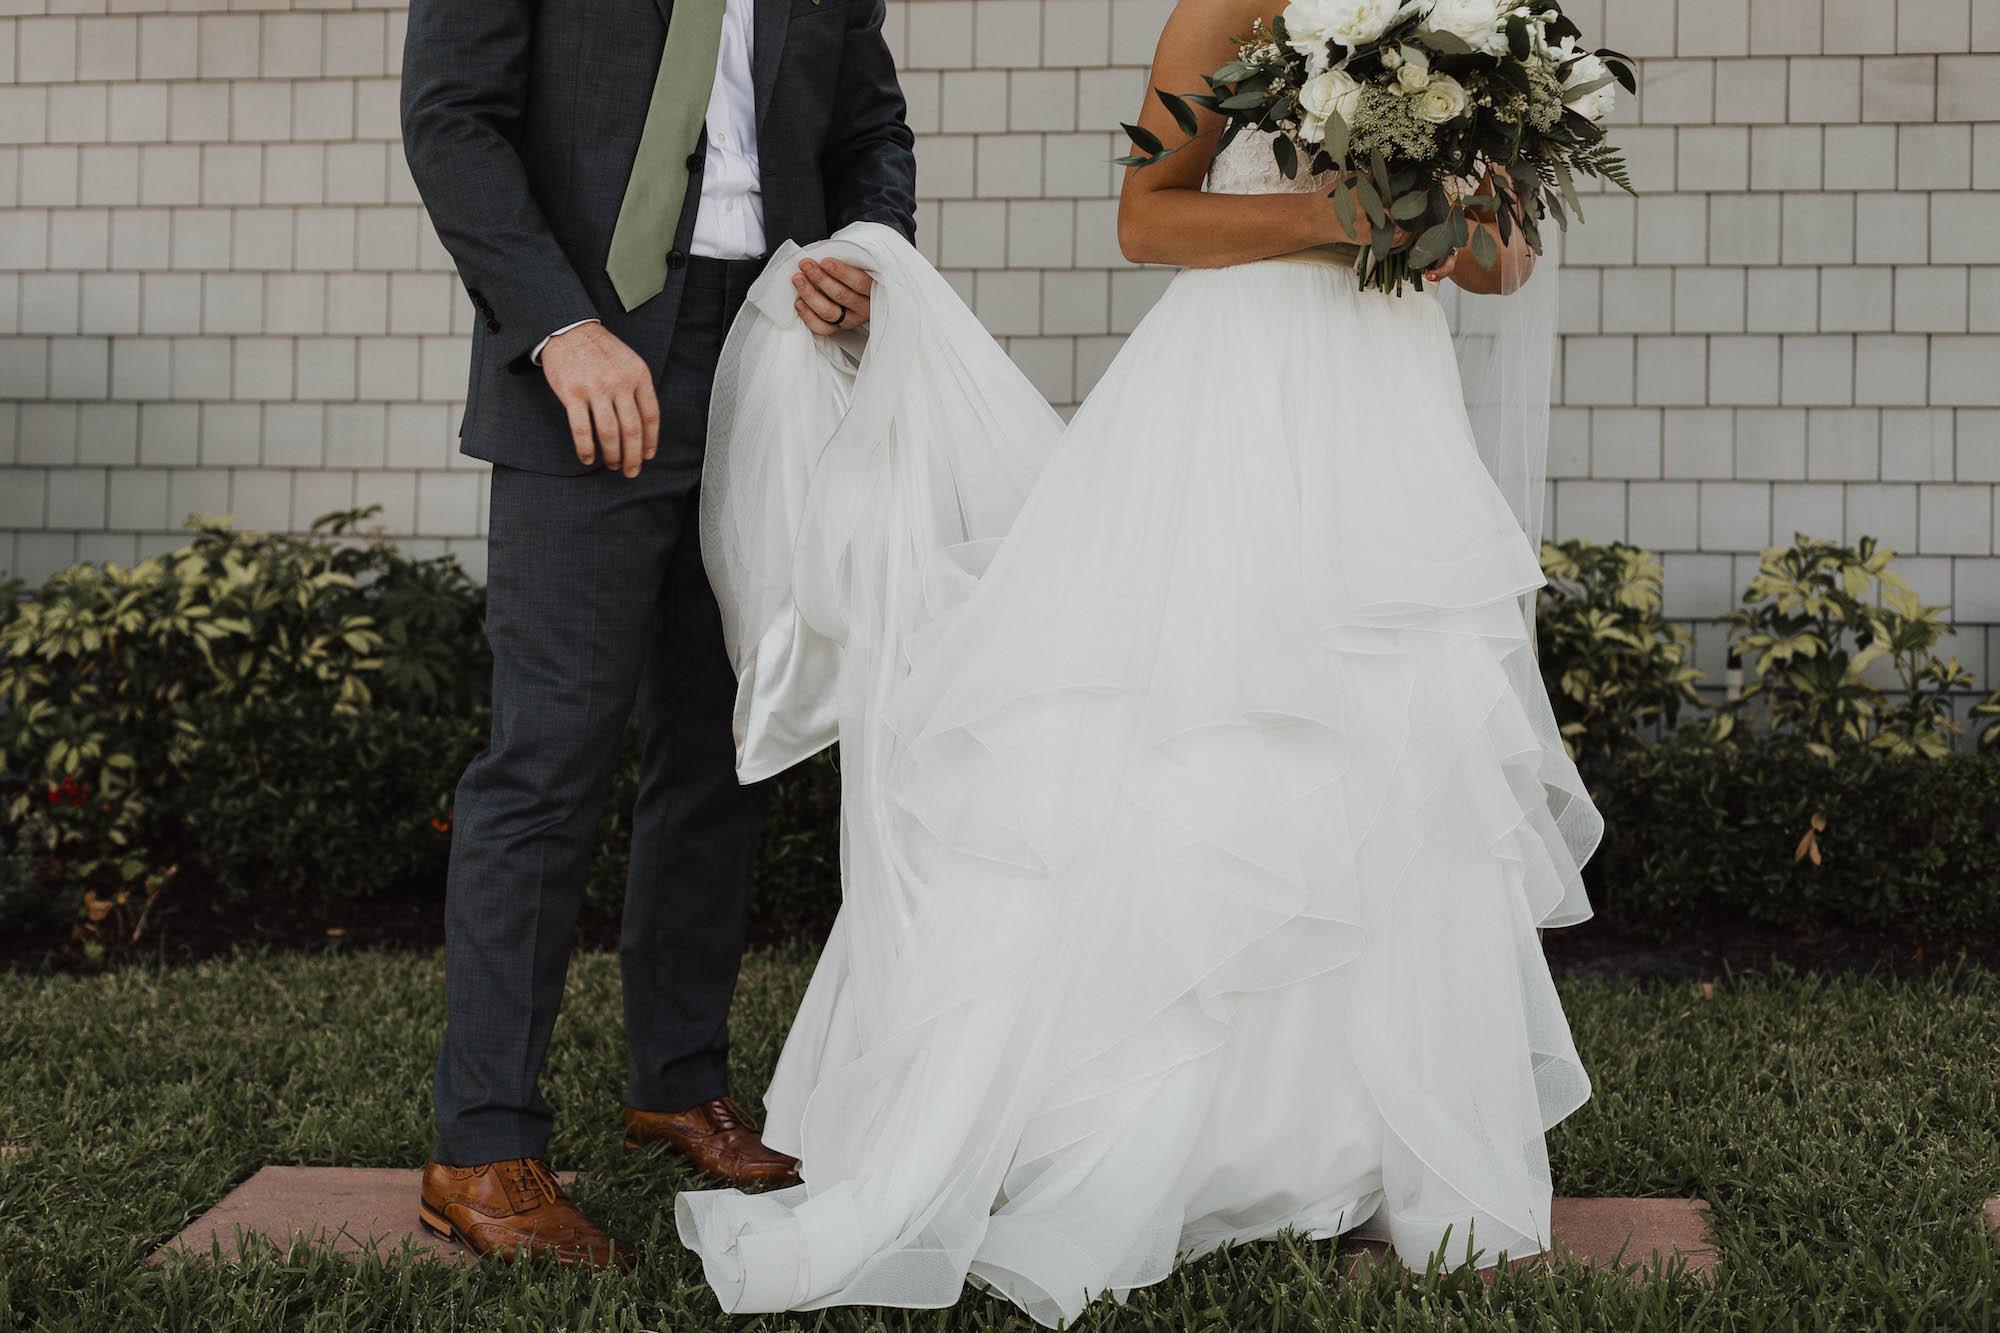 Creative Tampa Groom Holding Bride's Mikaella Cascading Ruffled Skirt Wedding Dress Skirt Portrait